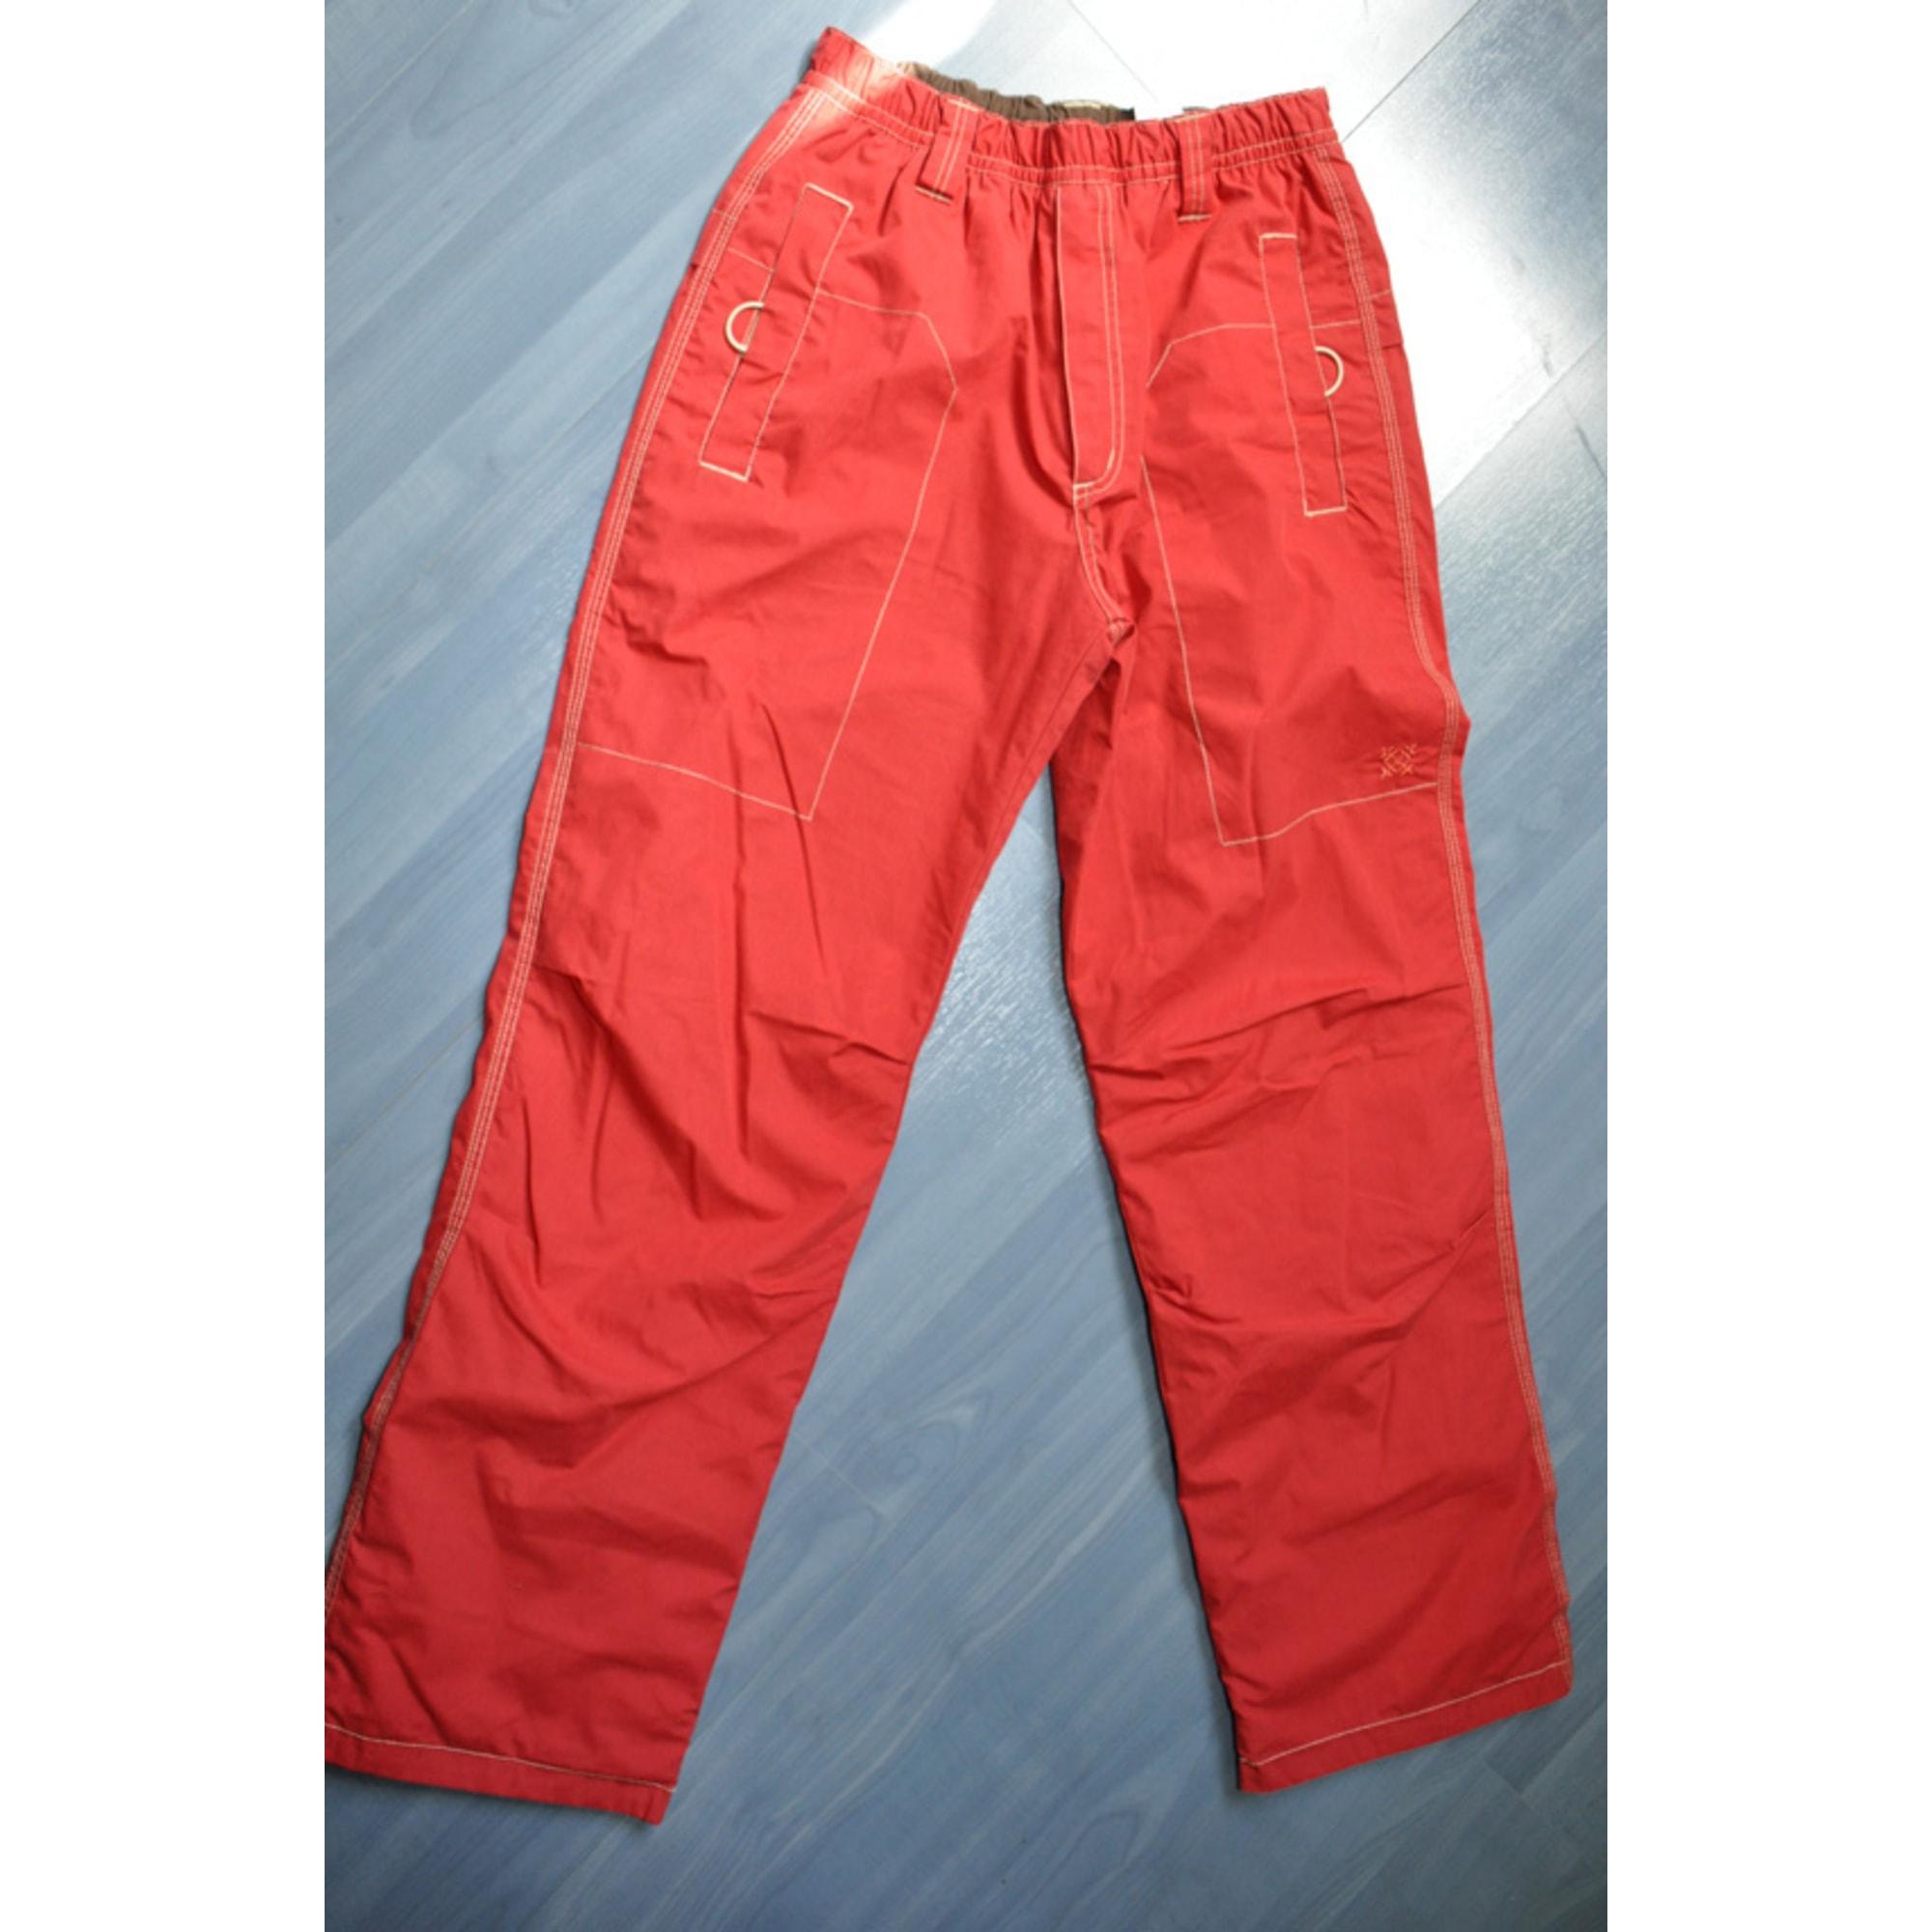 Pantalon OXBOW Rouge, bordeaux